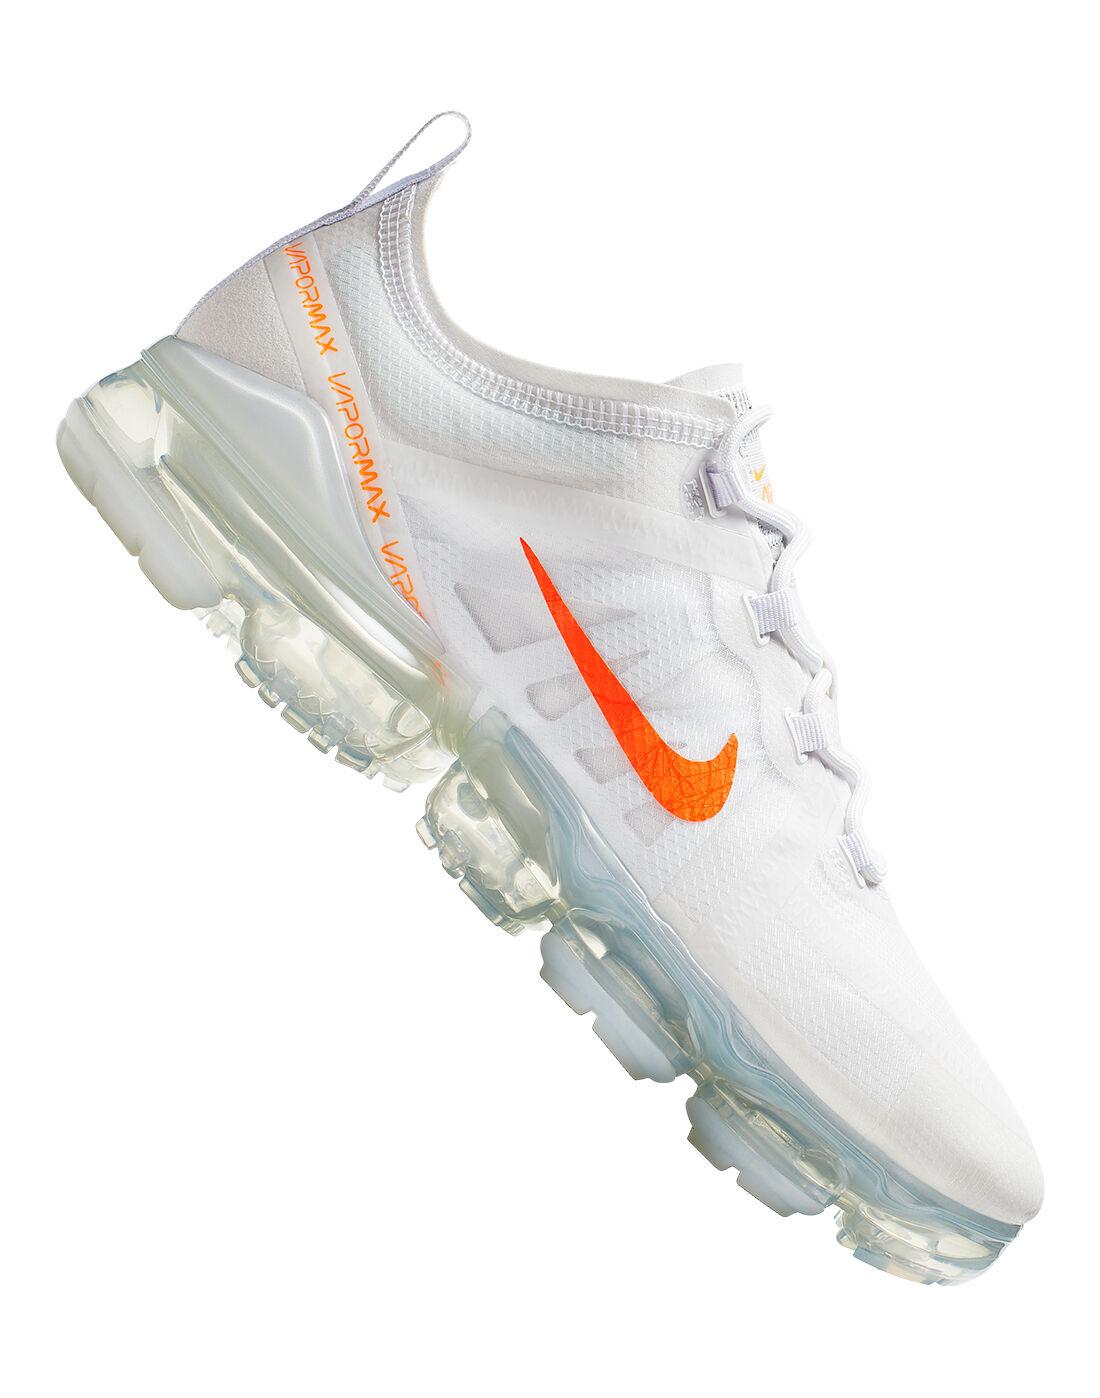 Men's White \u0026 Orange Nike Vapormax 2019